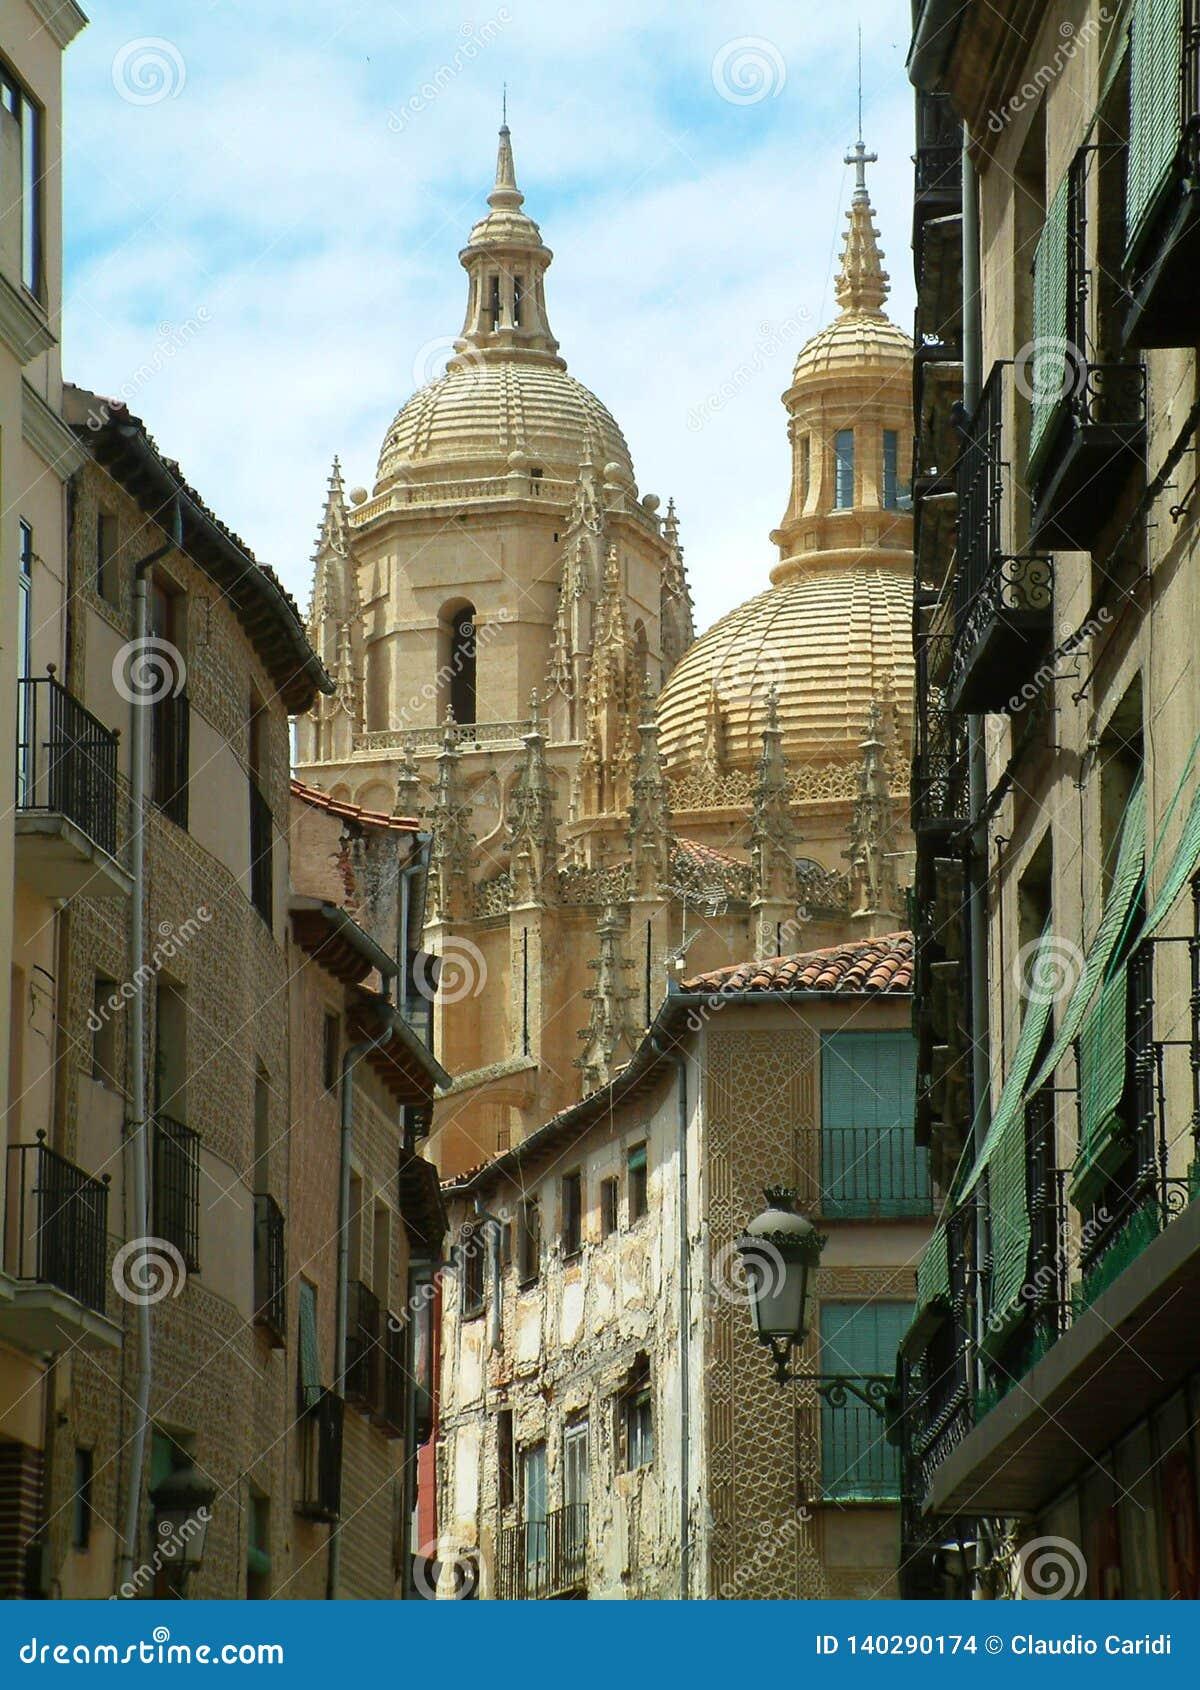 Segovia kathedraal, Segovia, Spanje